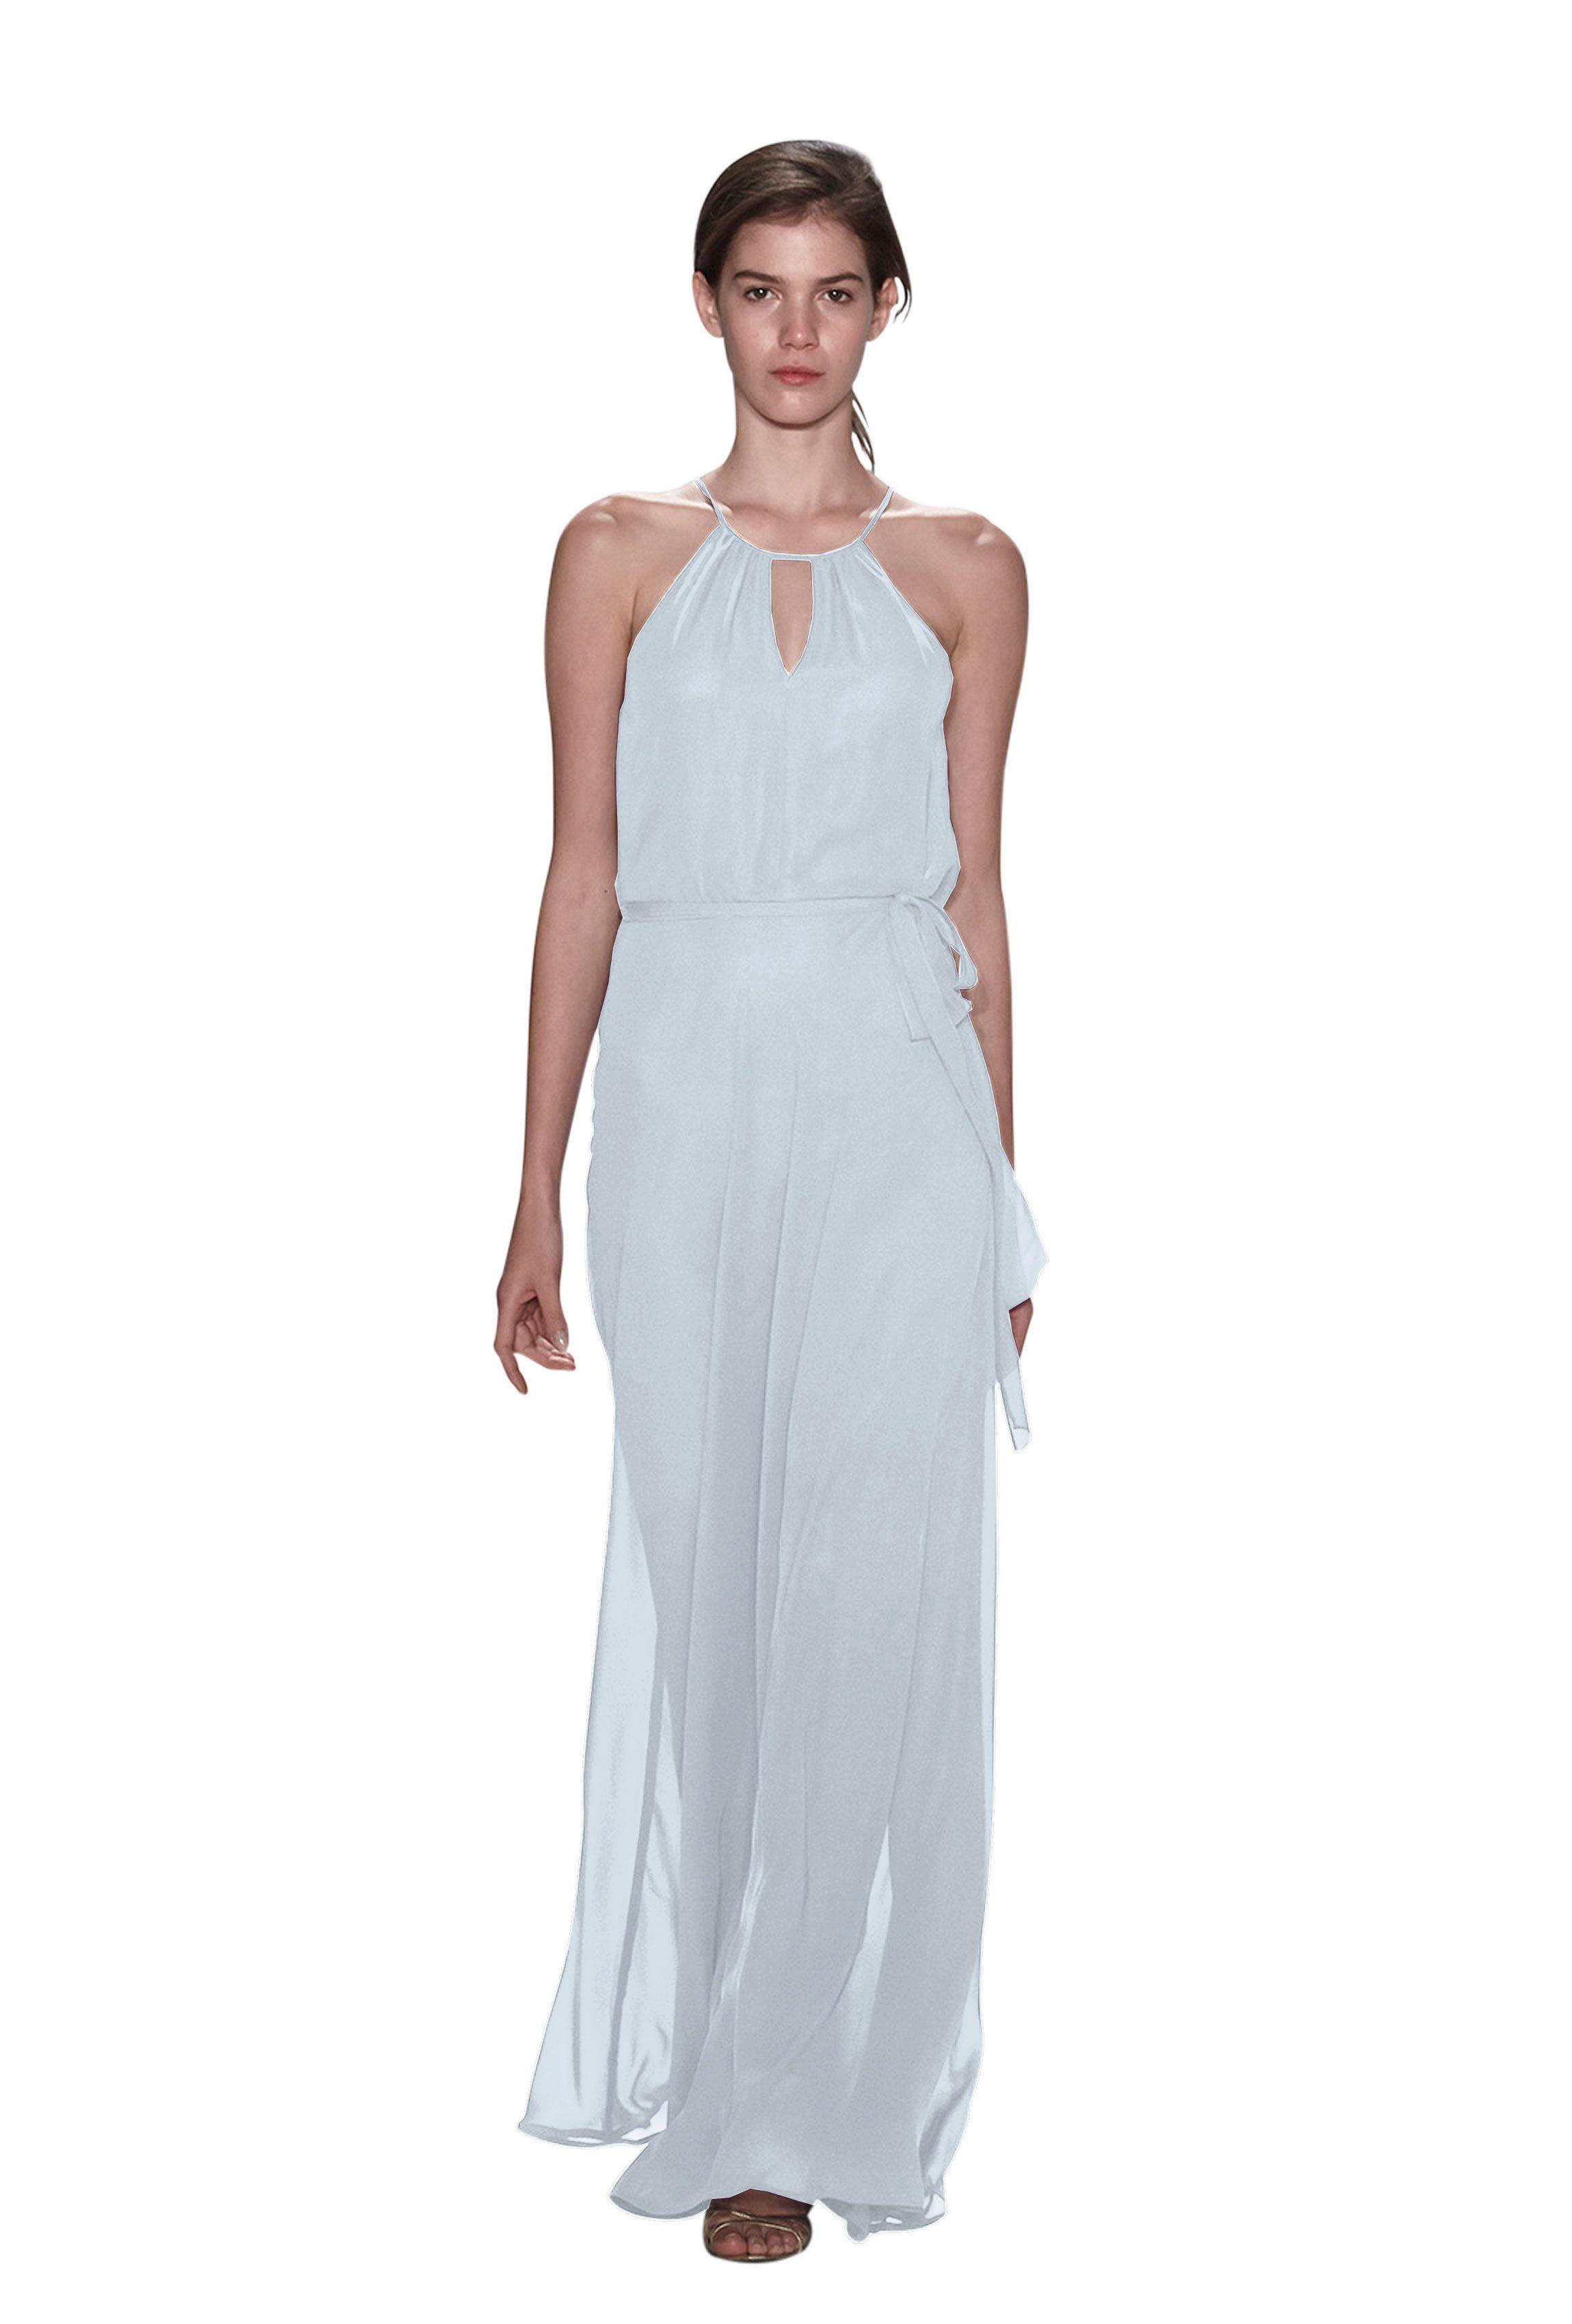 Nouvelle Amsale Angela | Chiffon bridesmaid dresses